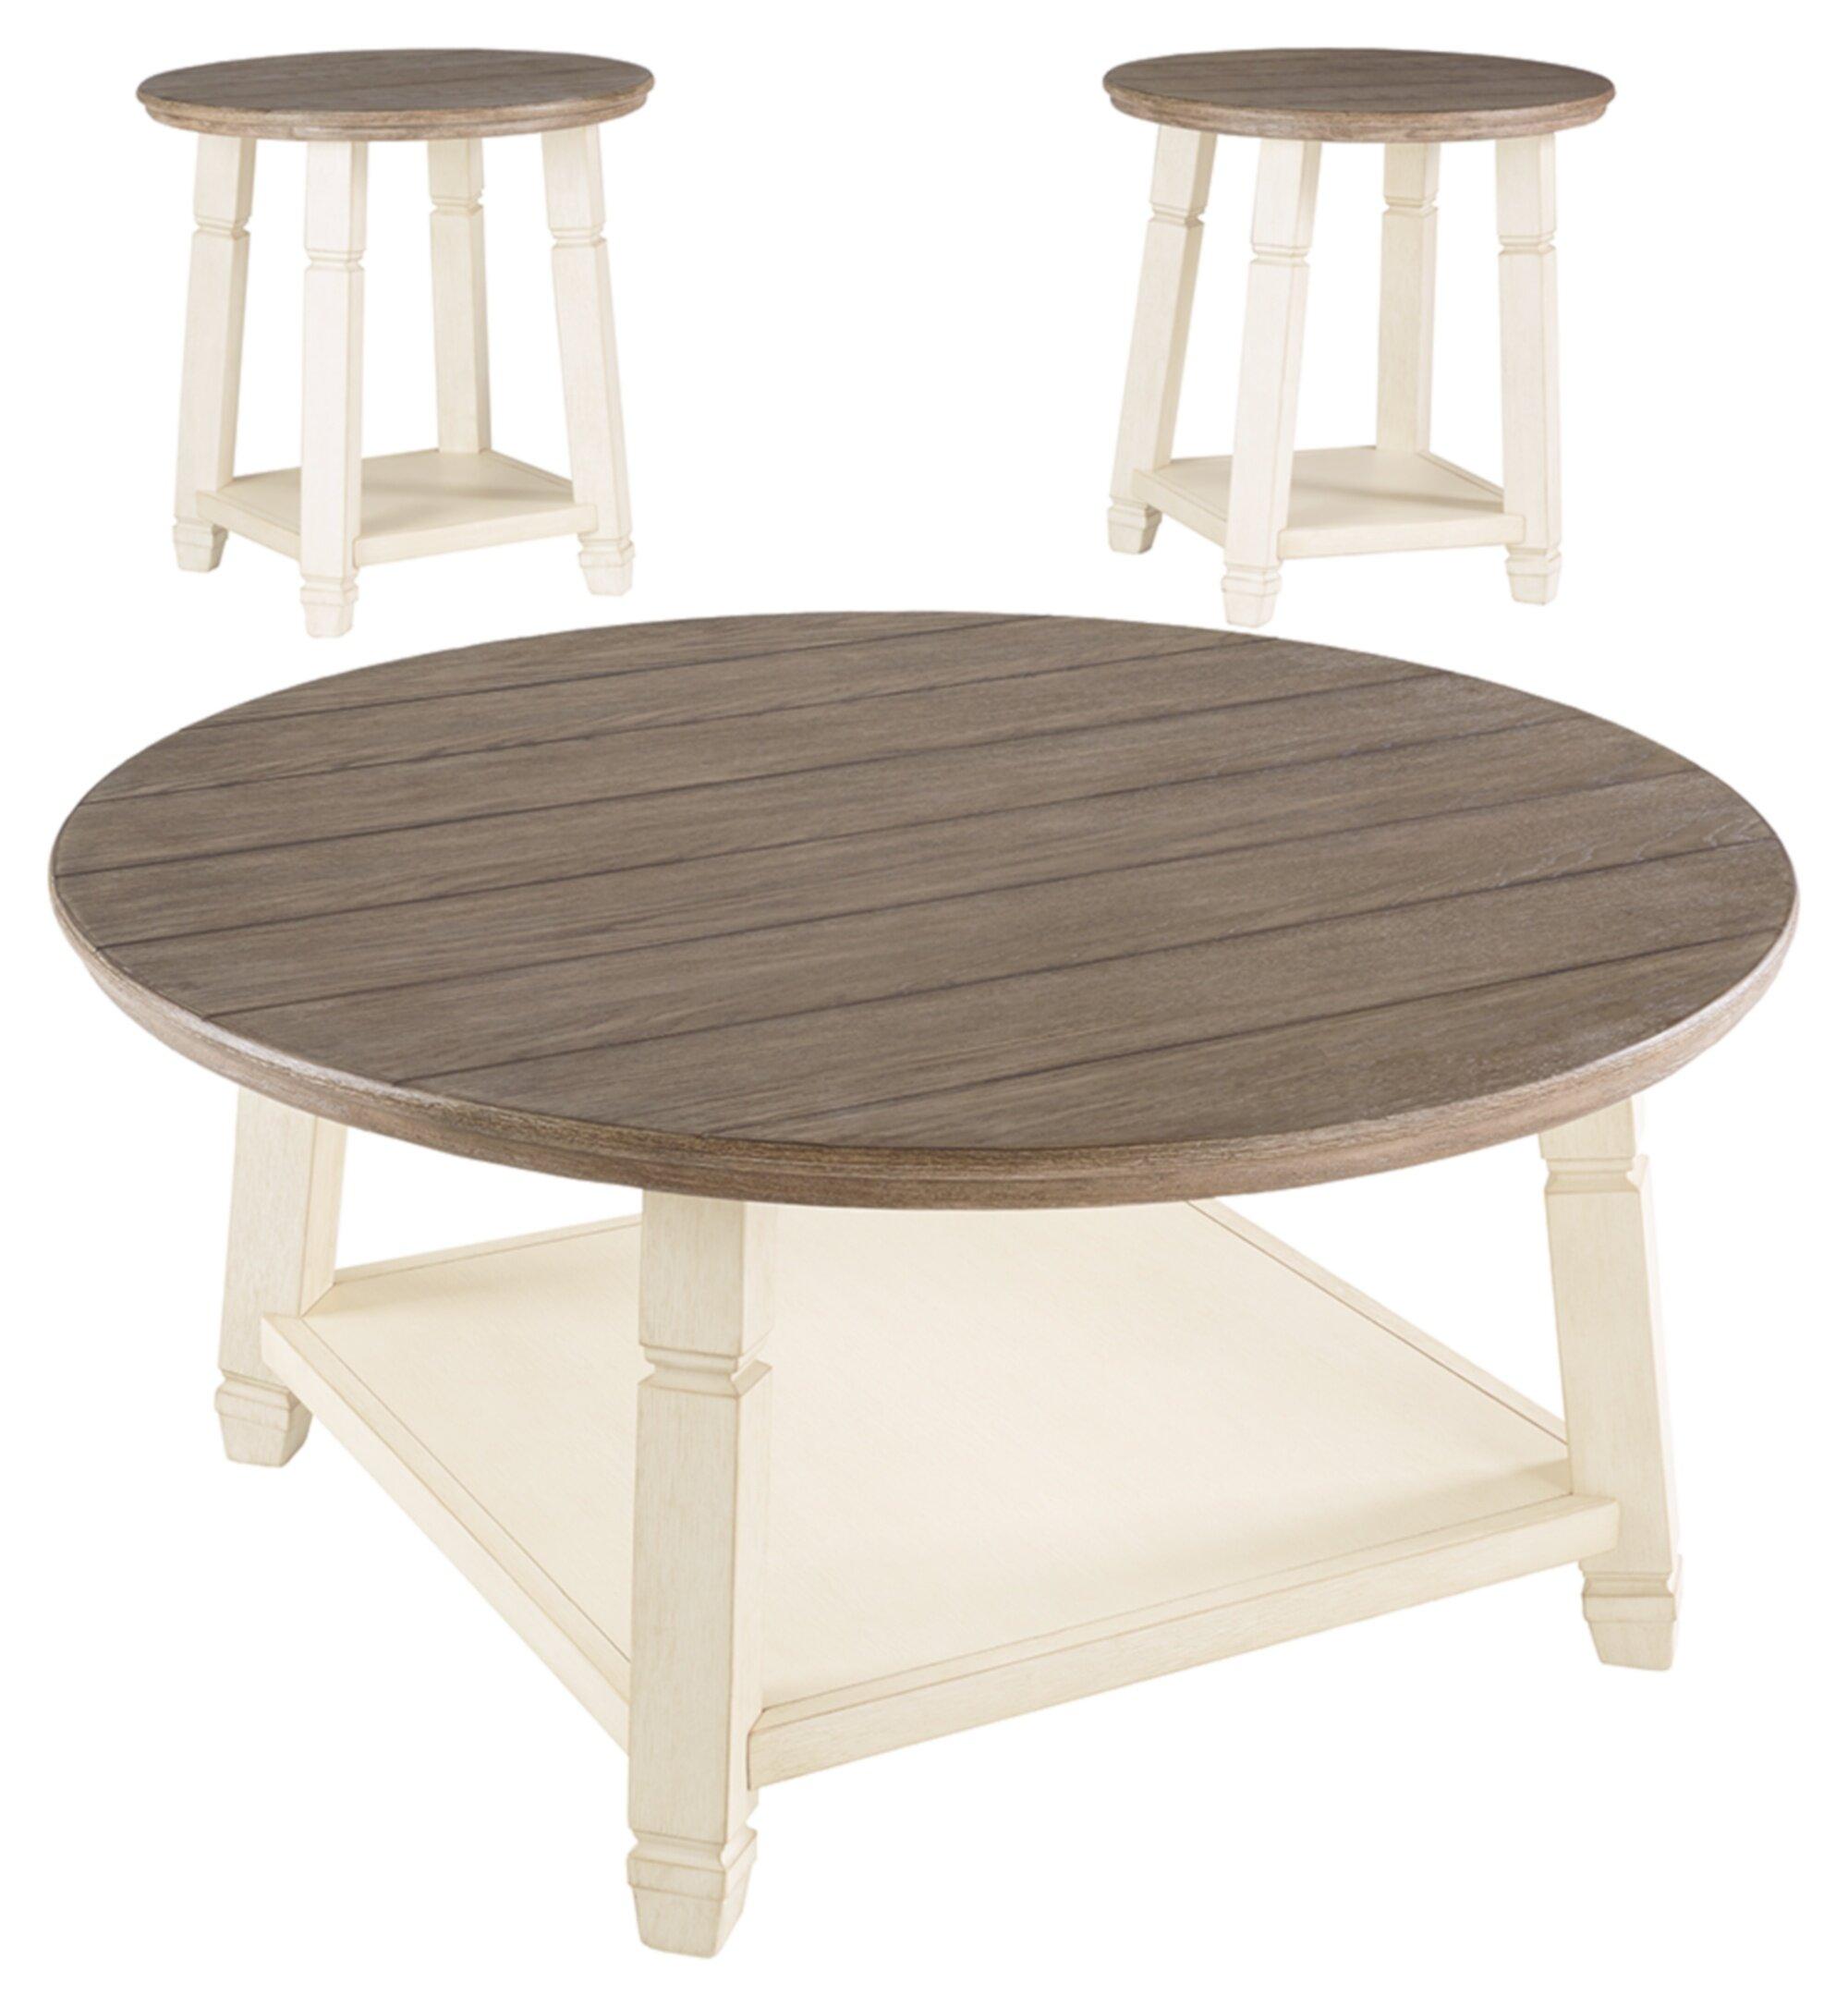 - August Grove Hackett 3 Piece Coffee Table Set & Reviews Wayfair